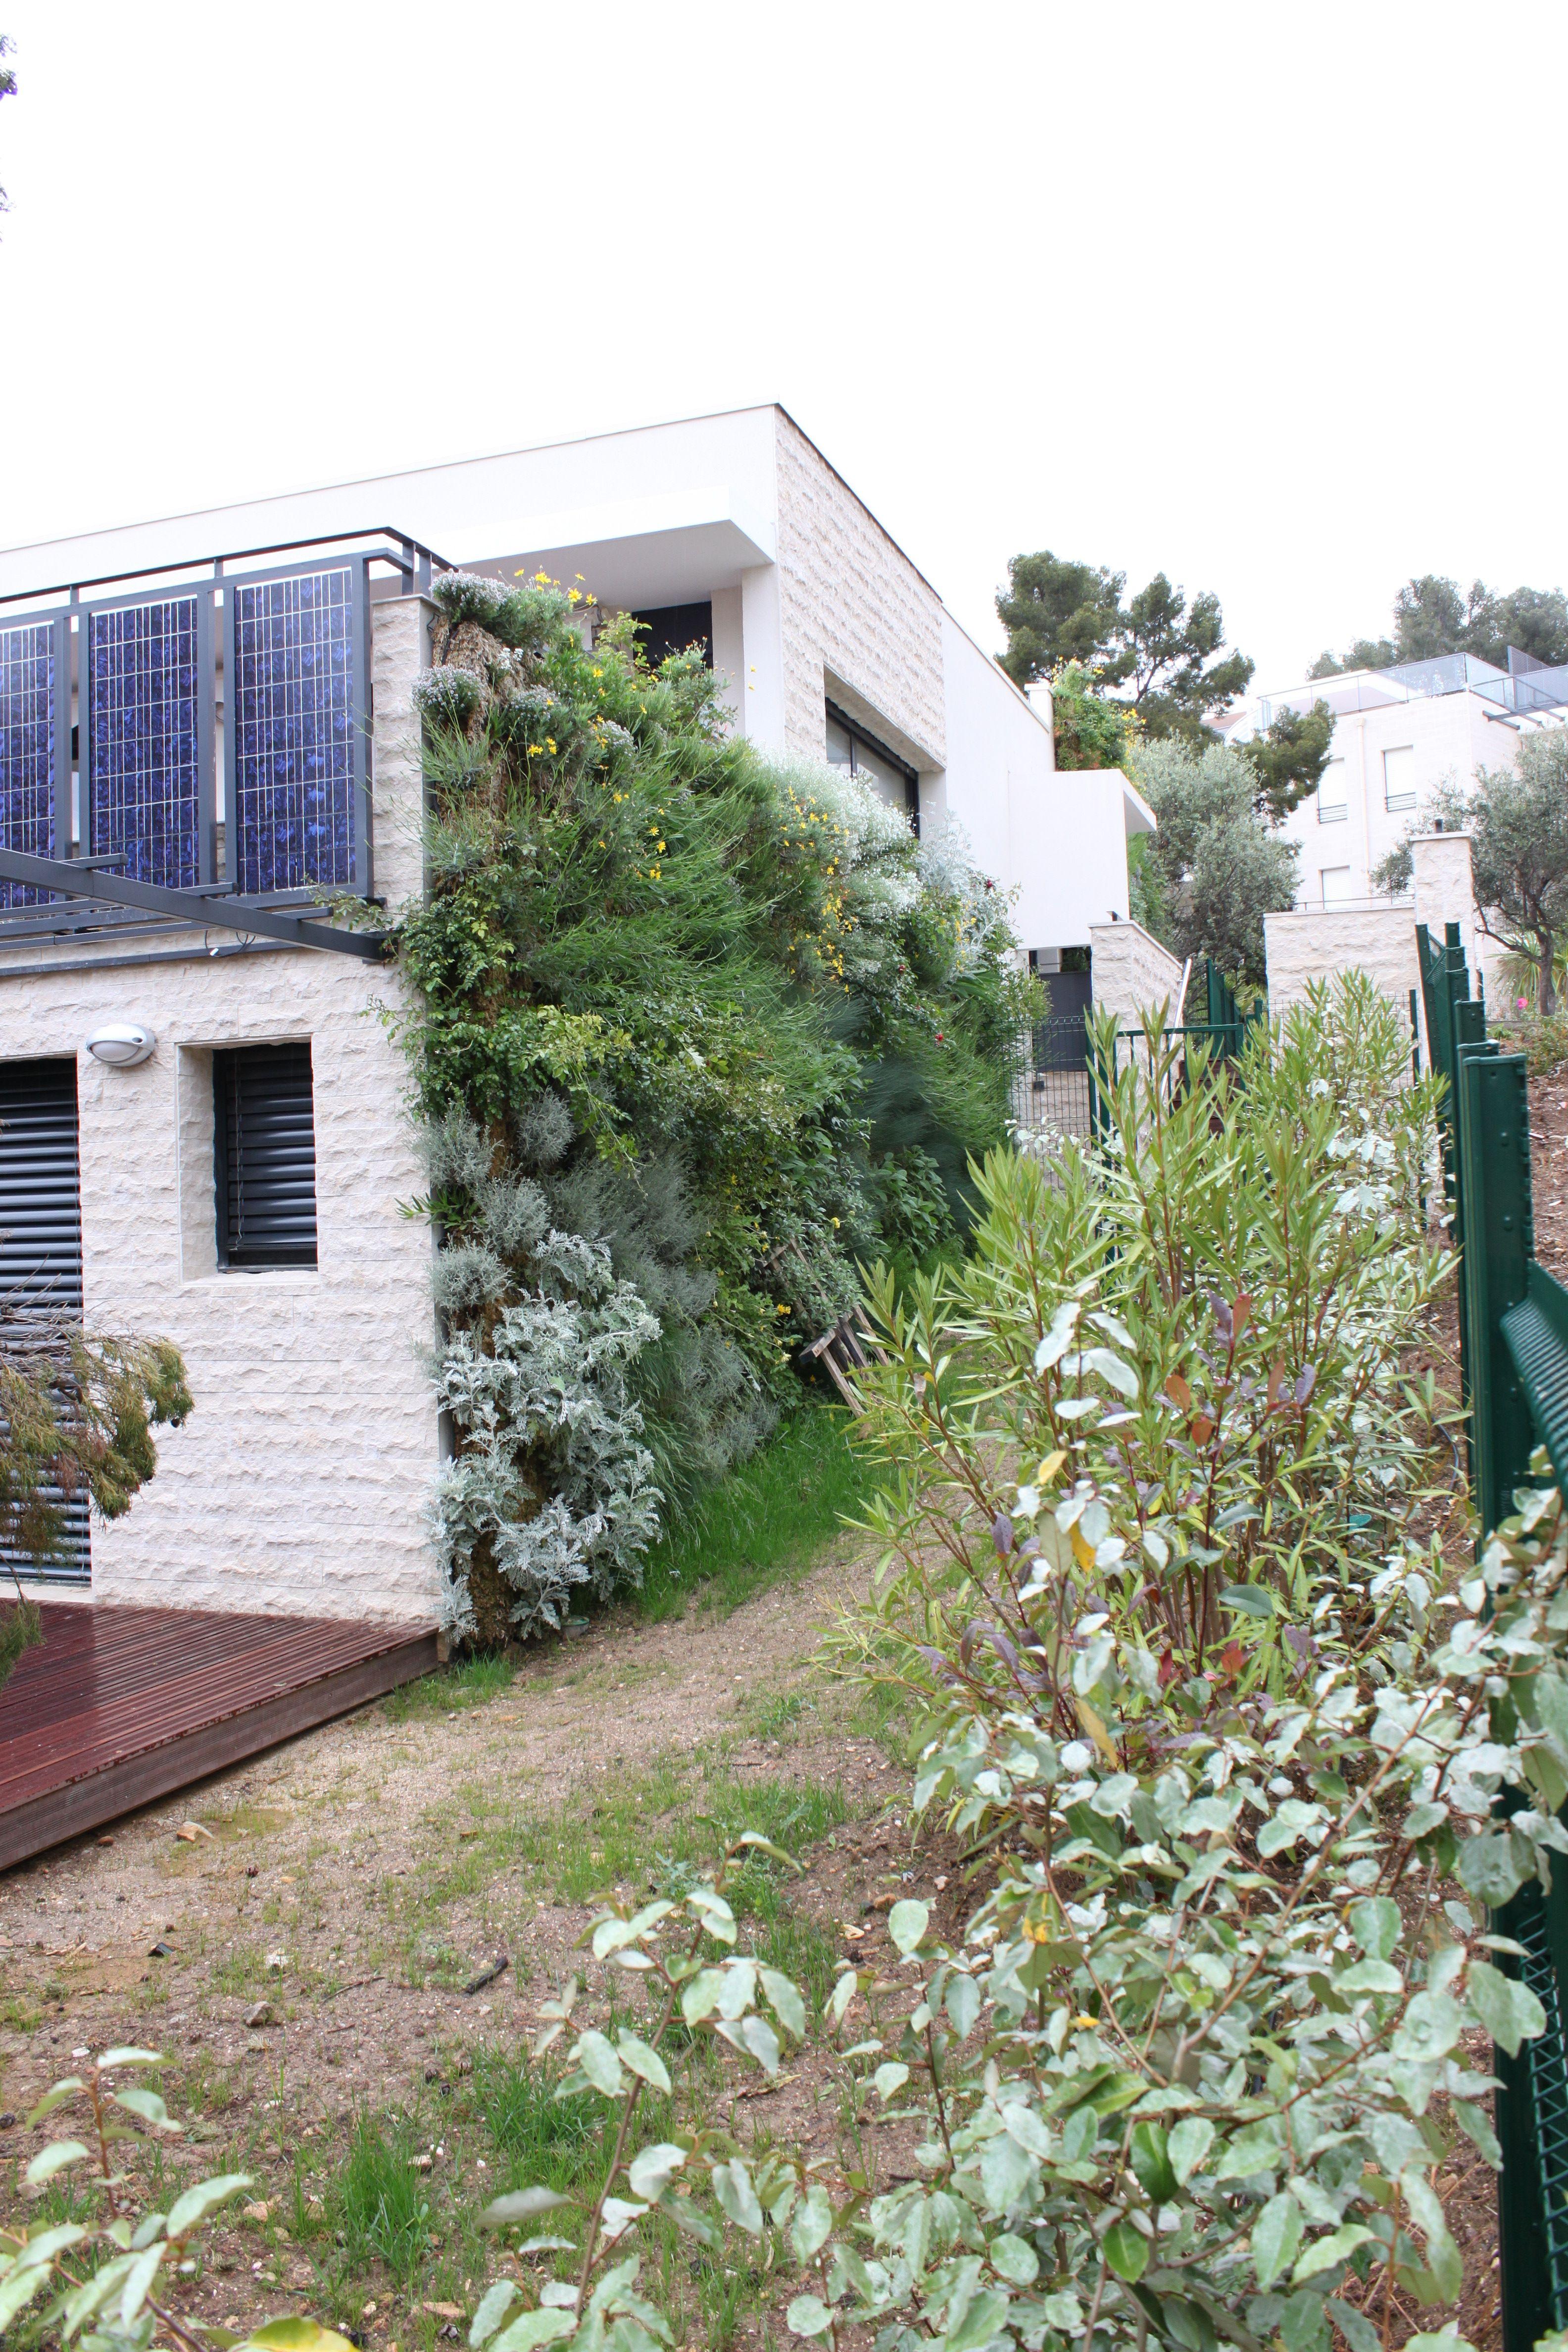 Creation Mur Vegetal Exterieur mur végétal exterieur | mur végétal exterieur, mur vegetal